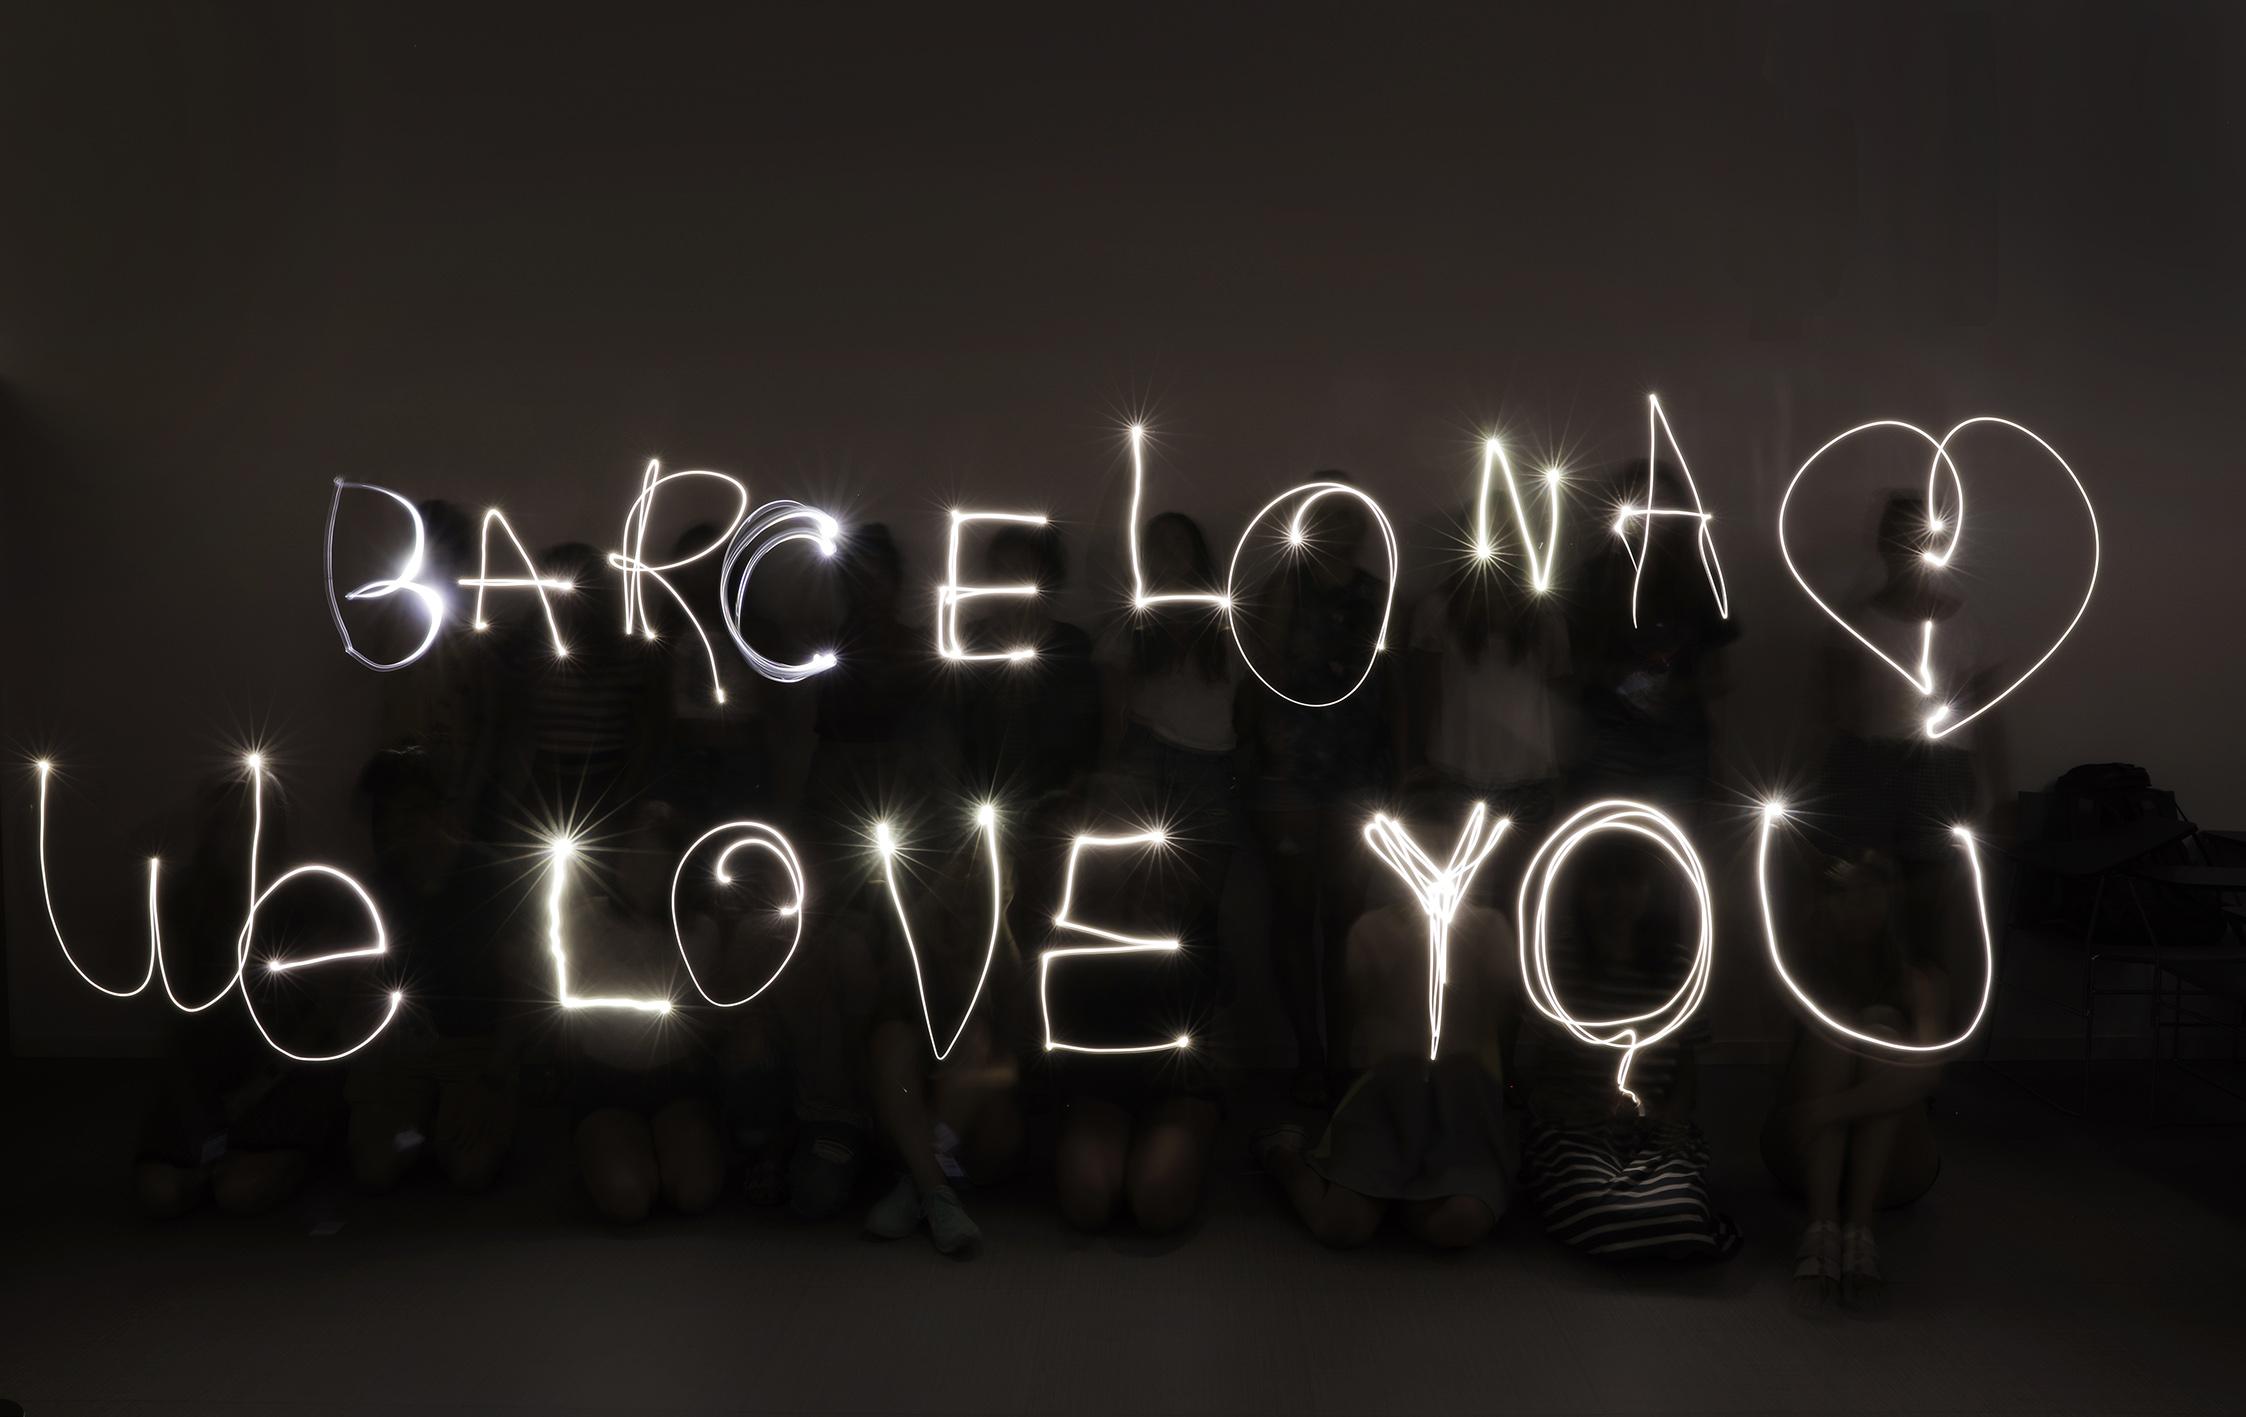 Barcelona, love you